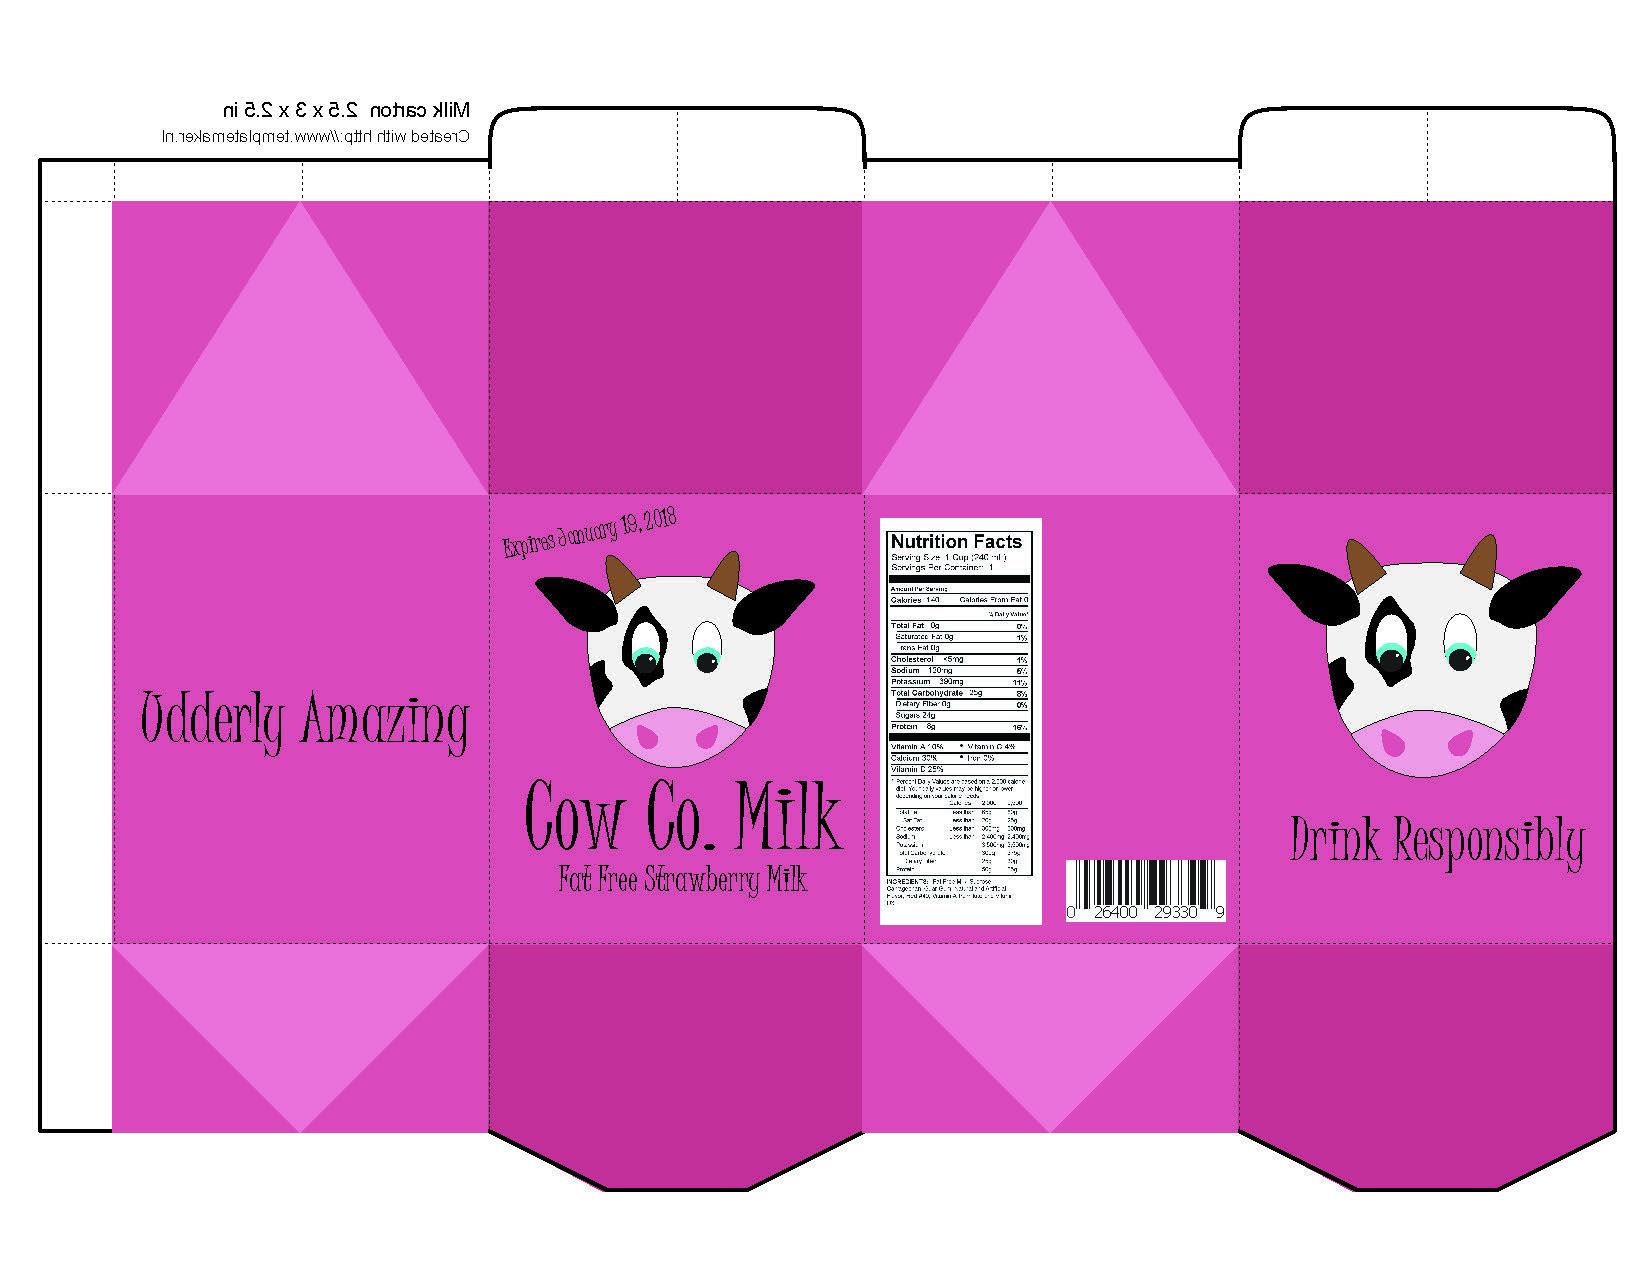 milk carton 1day